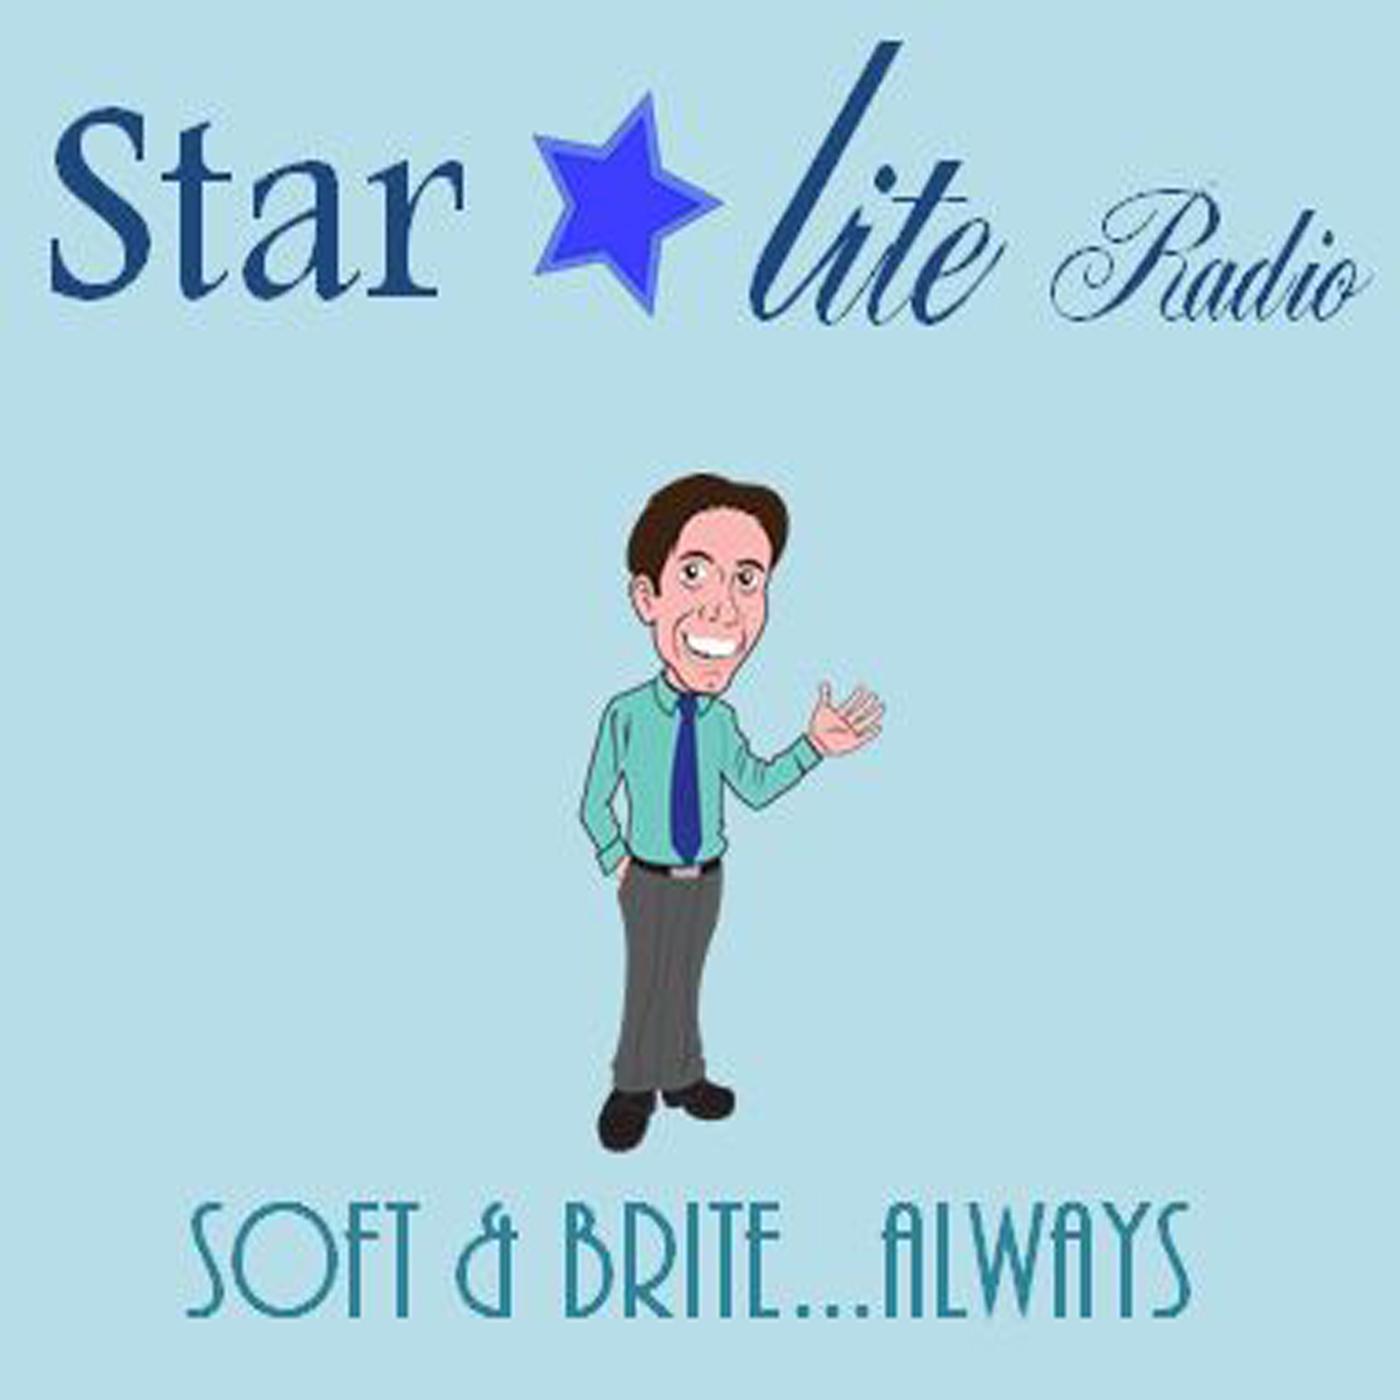 Starlite Soft & Brite